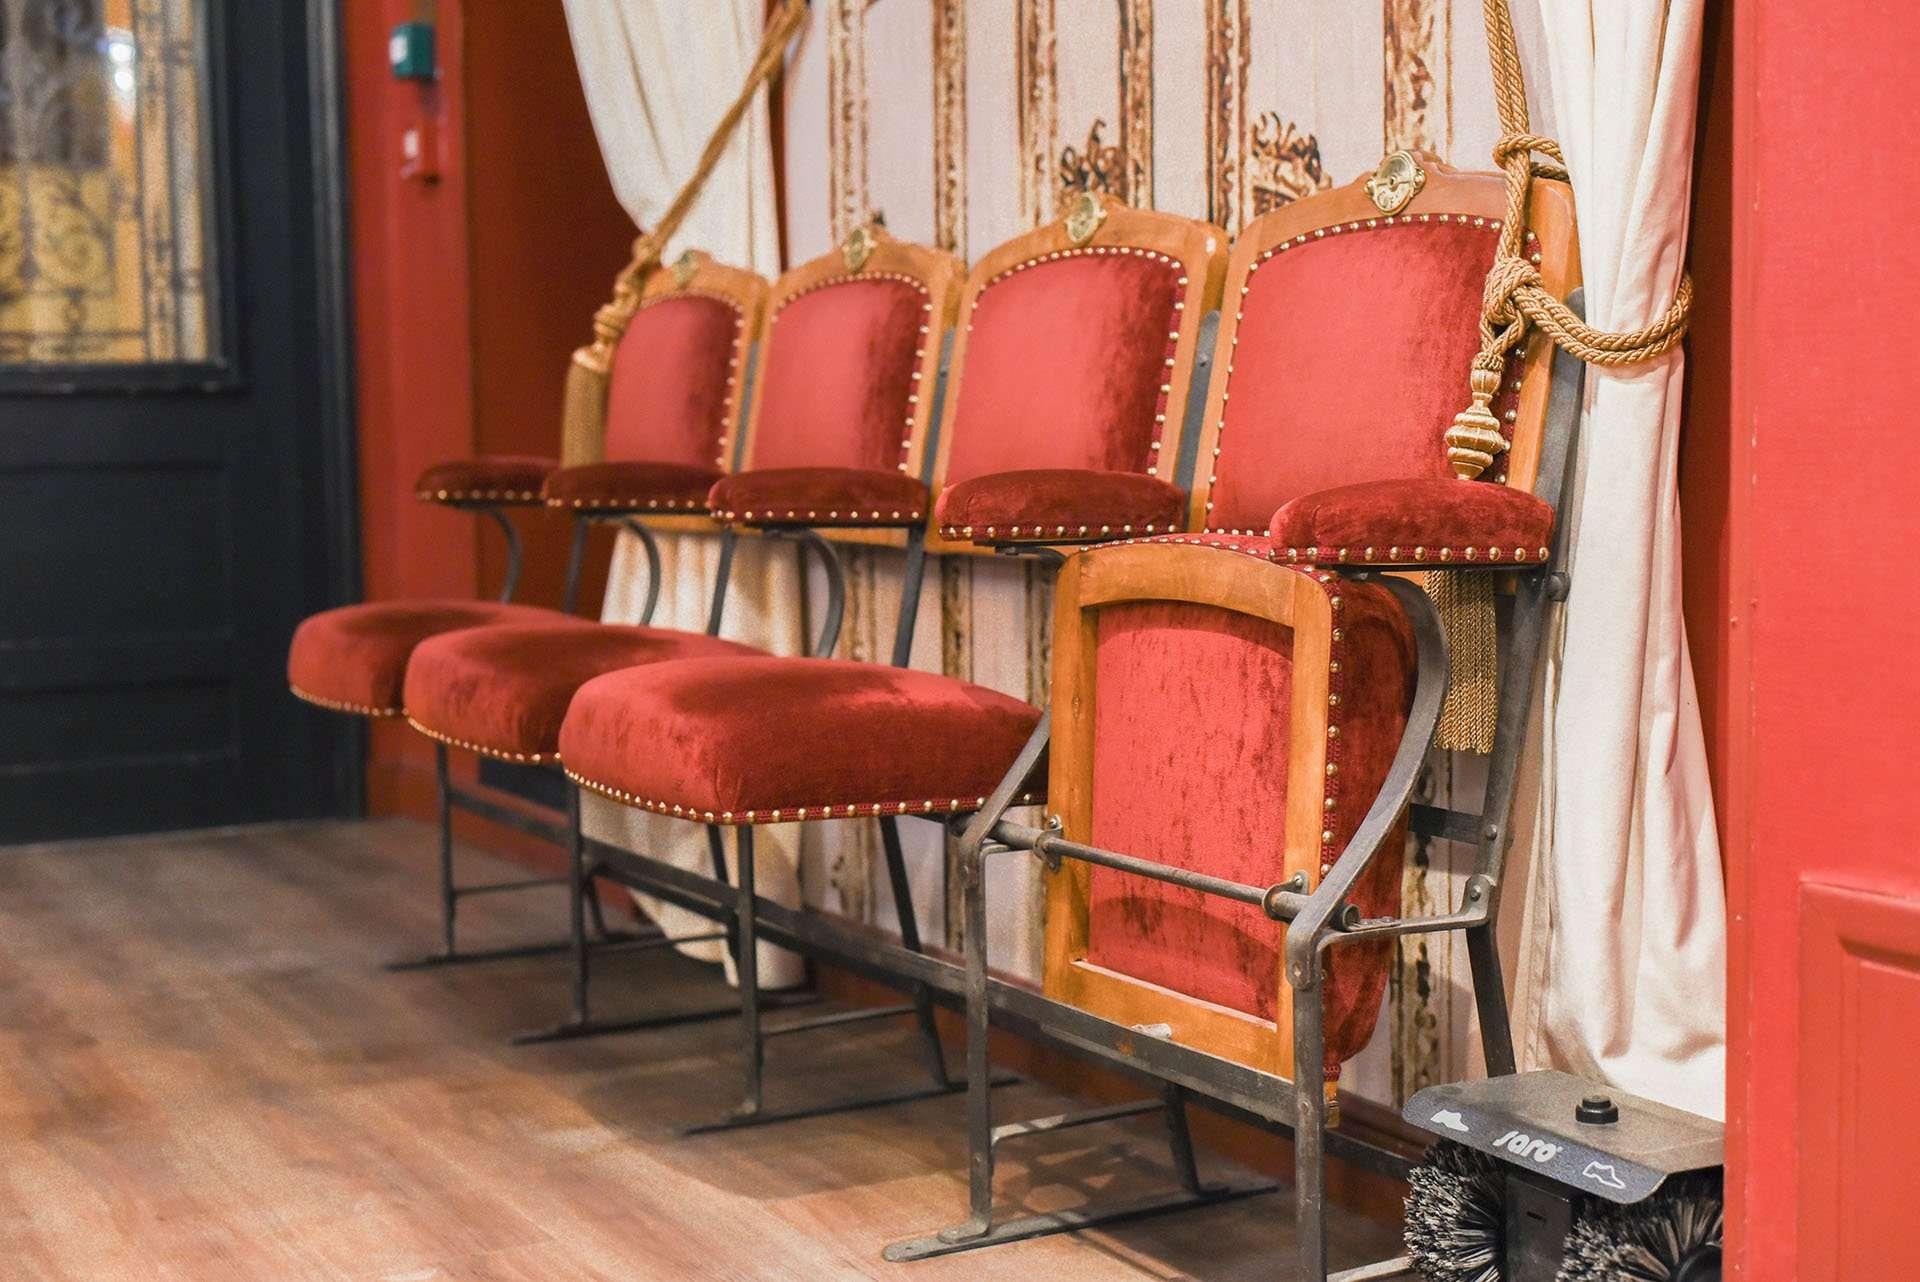 Theater-style lobby seats at Hotel Sacha